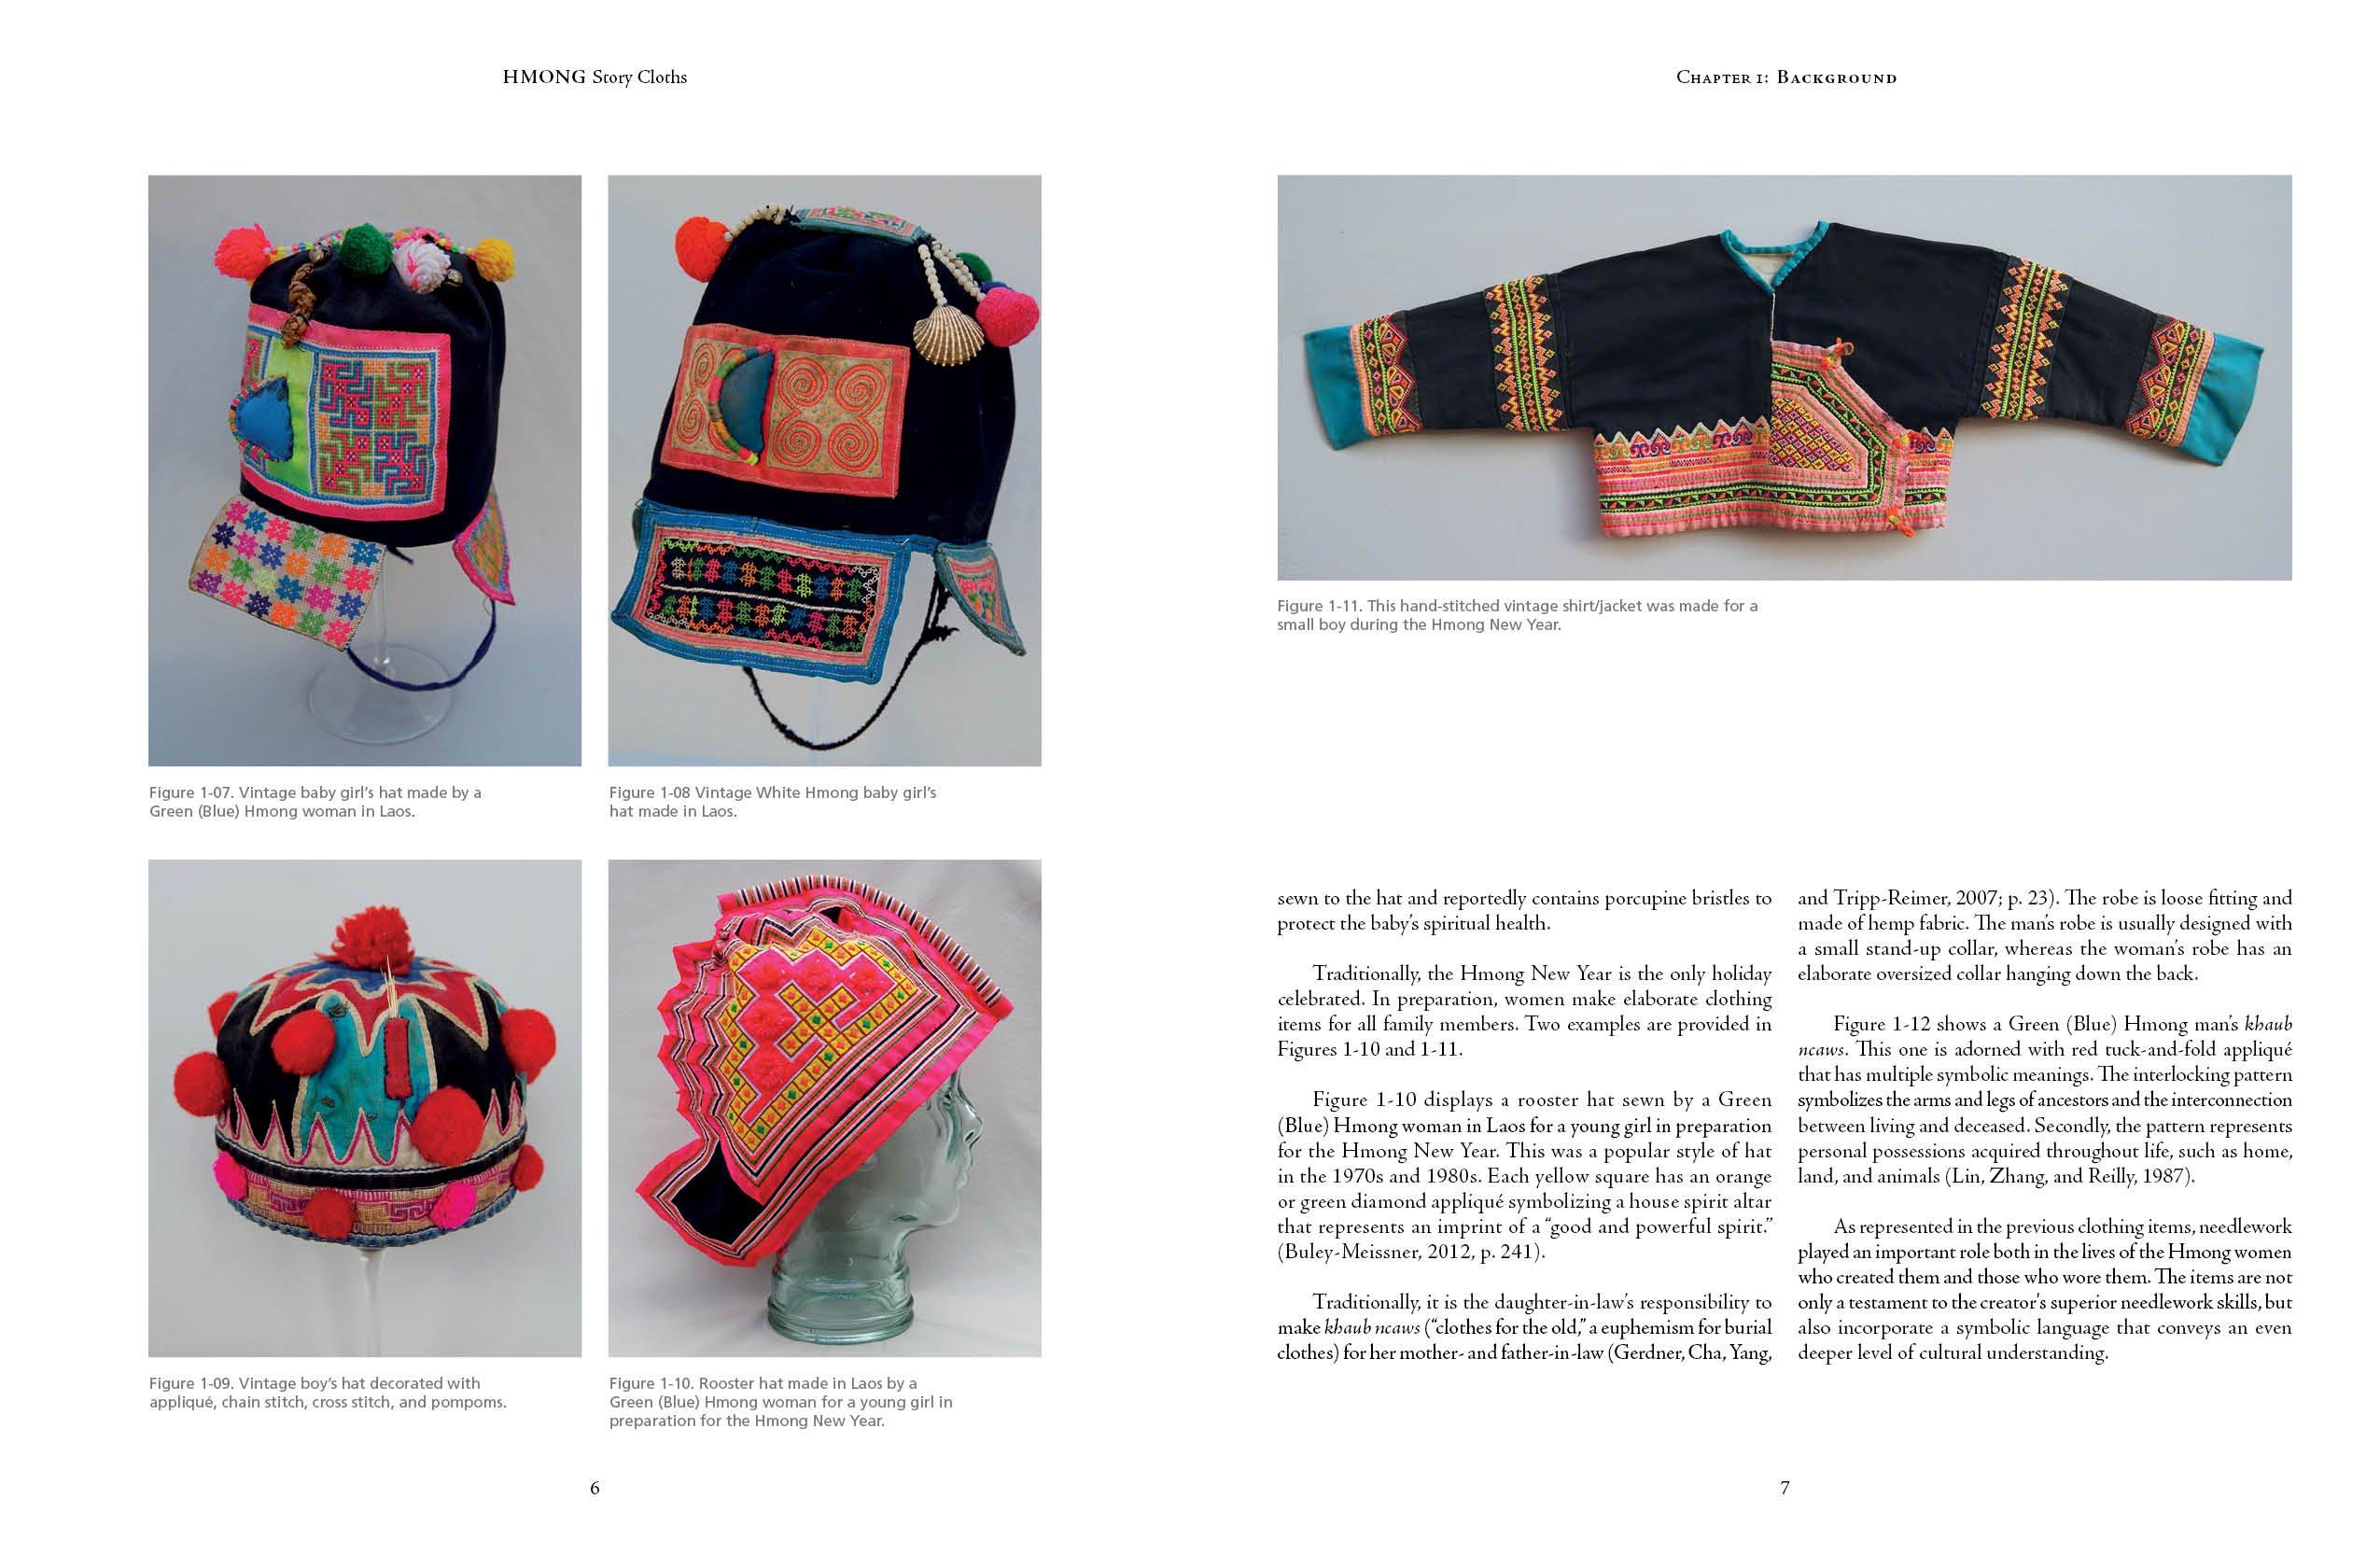 Amazon com: Hmong Story Cloths: Preserving Historical & Cultural